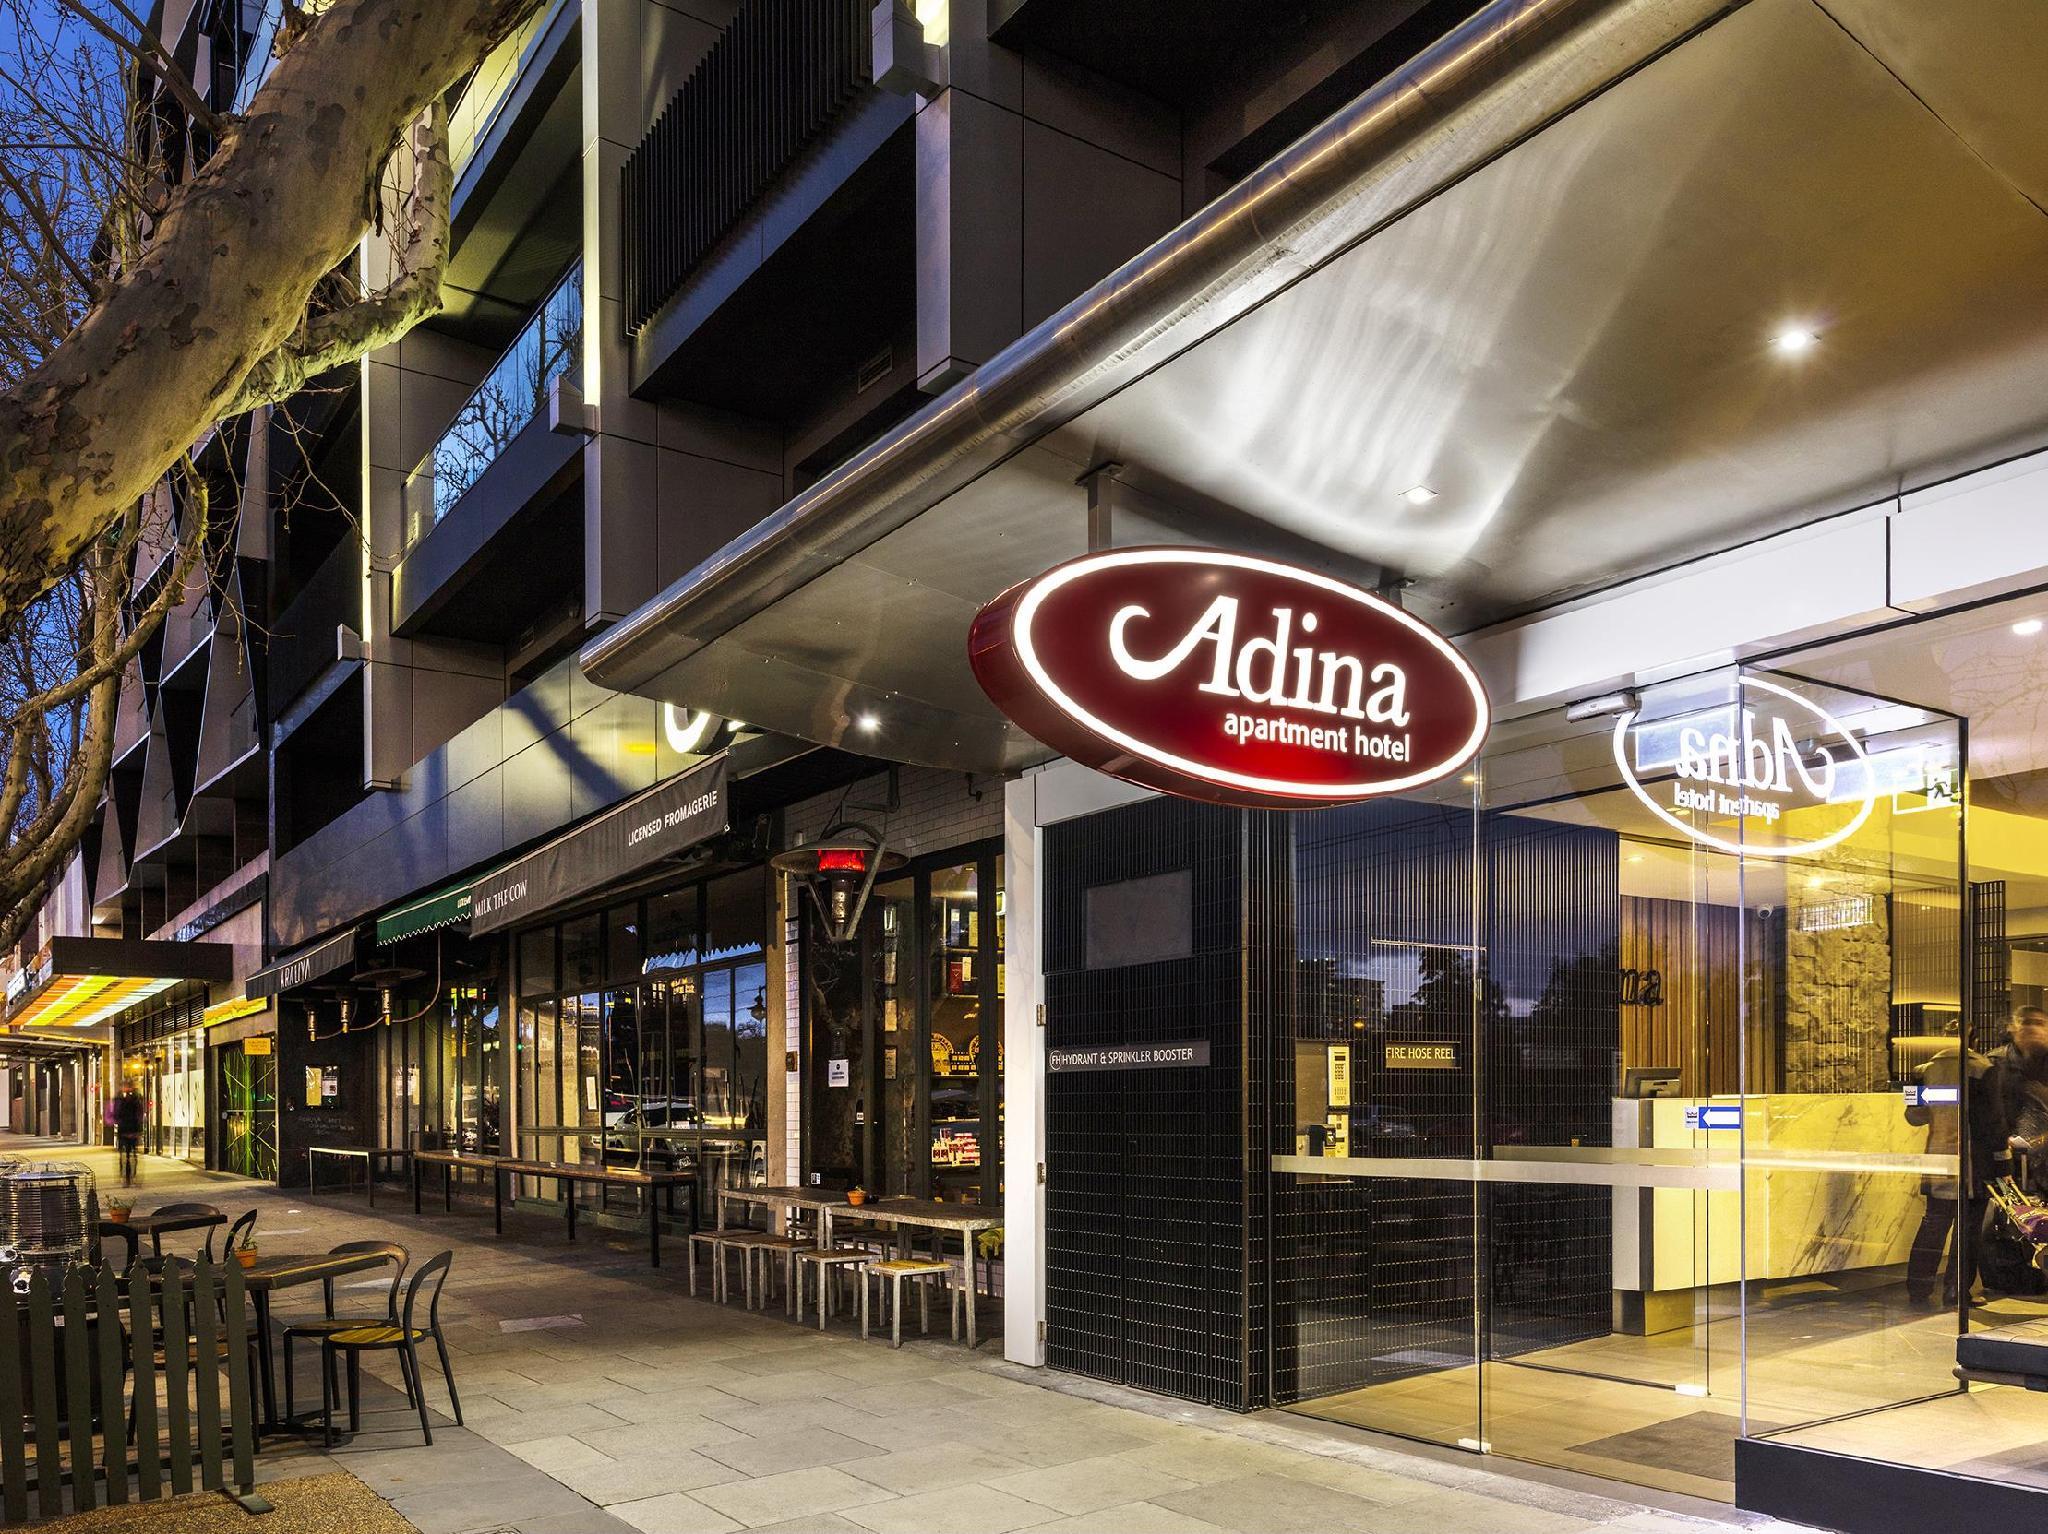 Adina Apartment Hotel St Kilda Melbourne – Photos, Rates & Deals